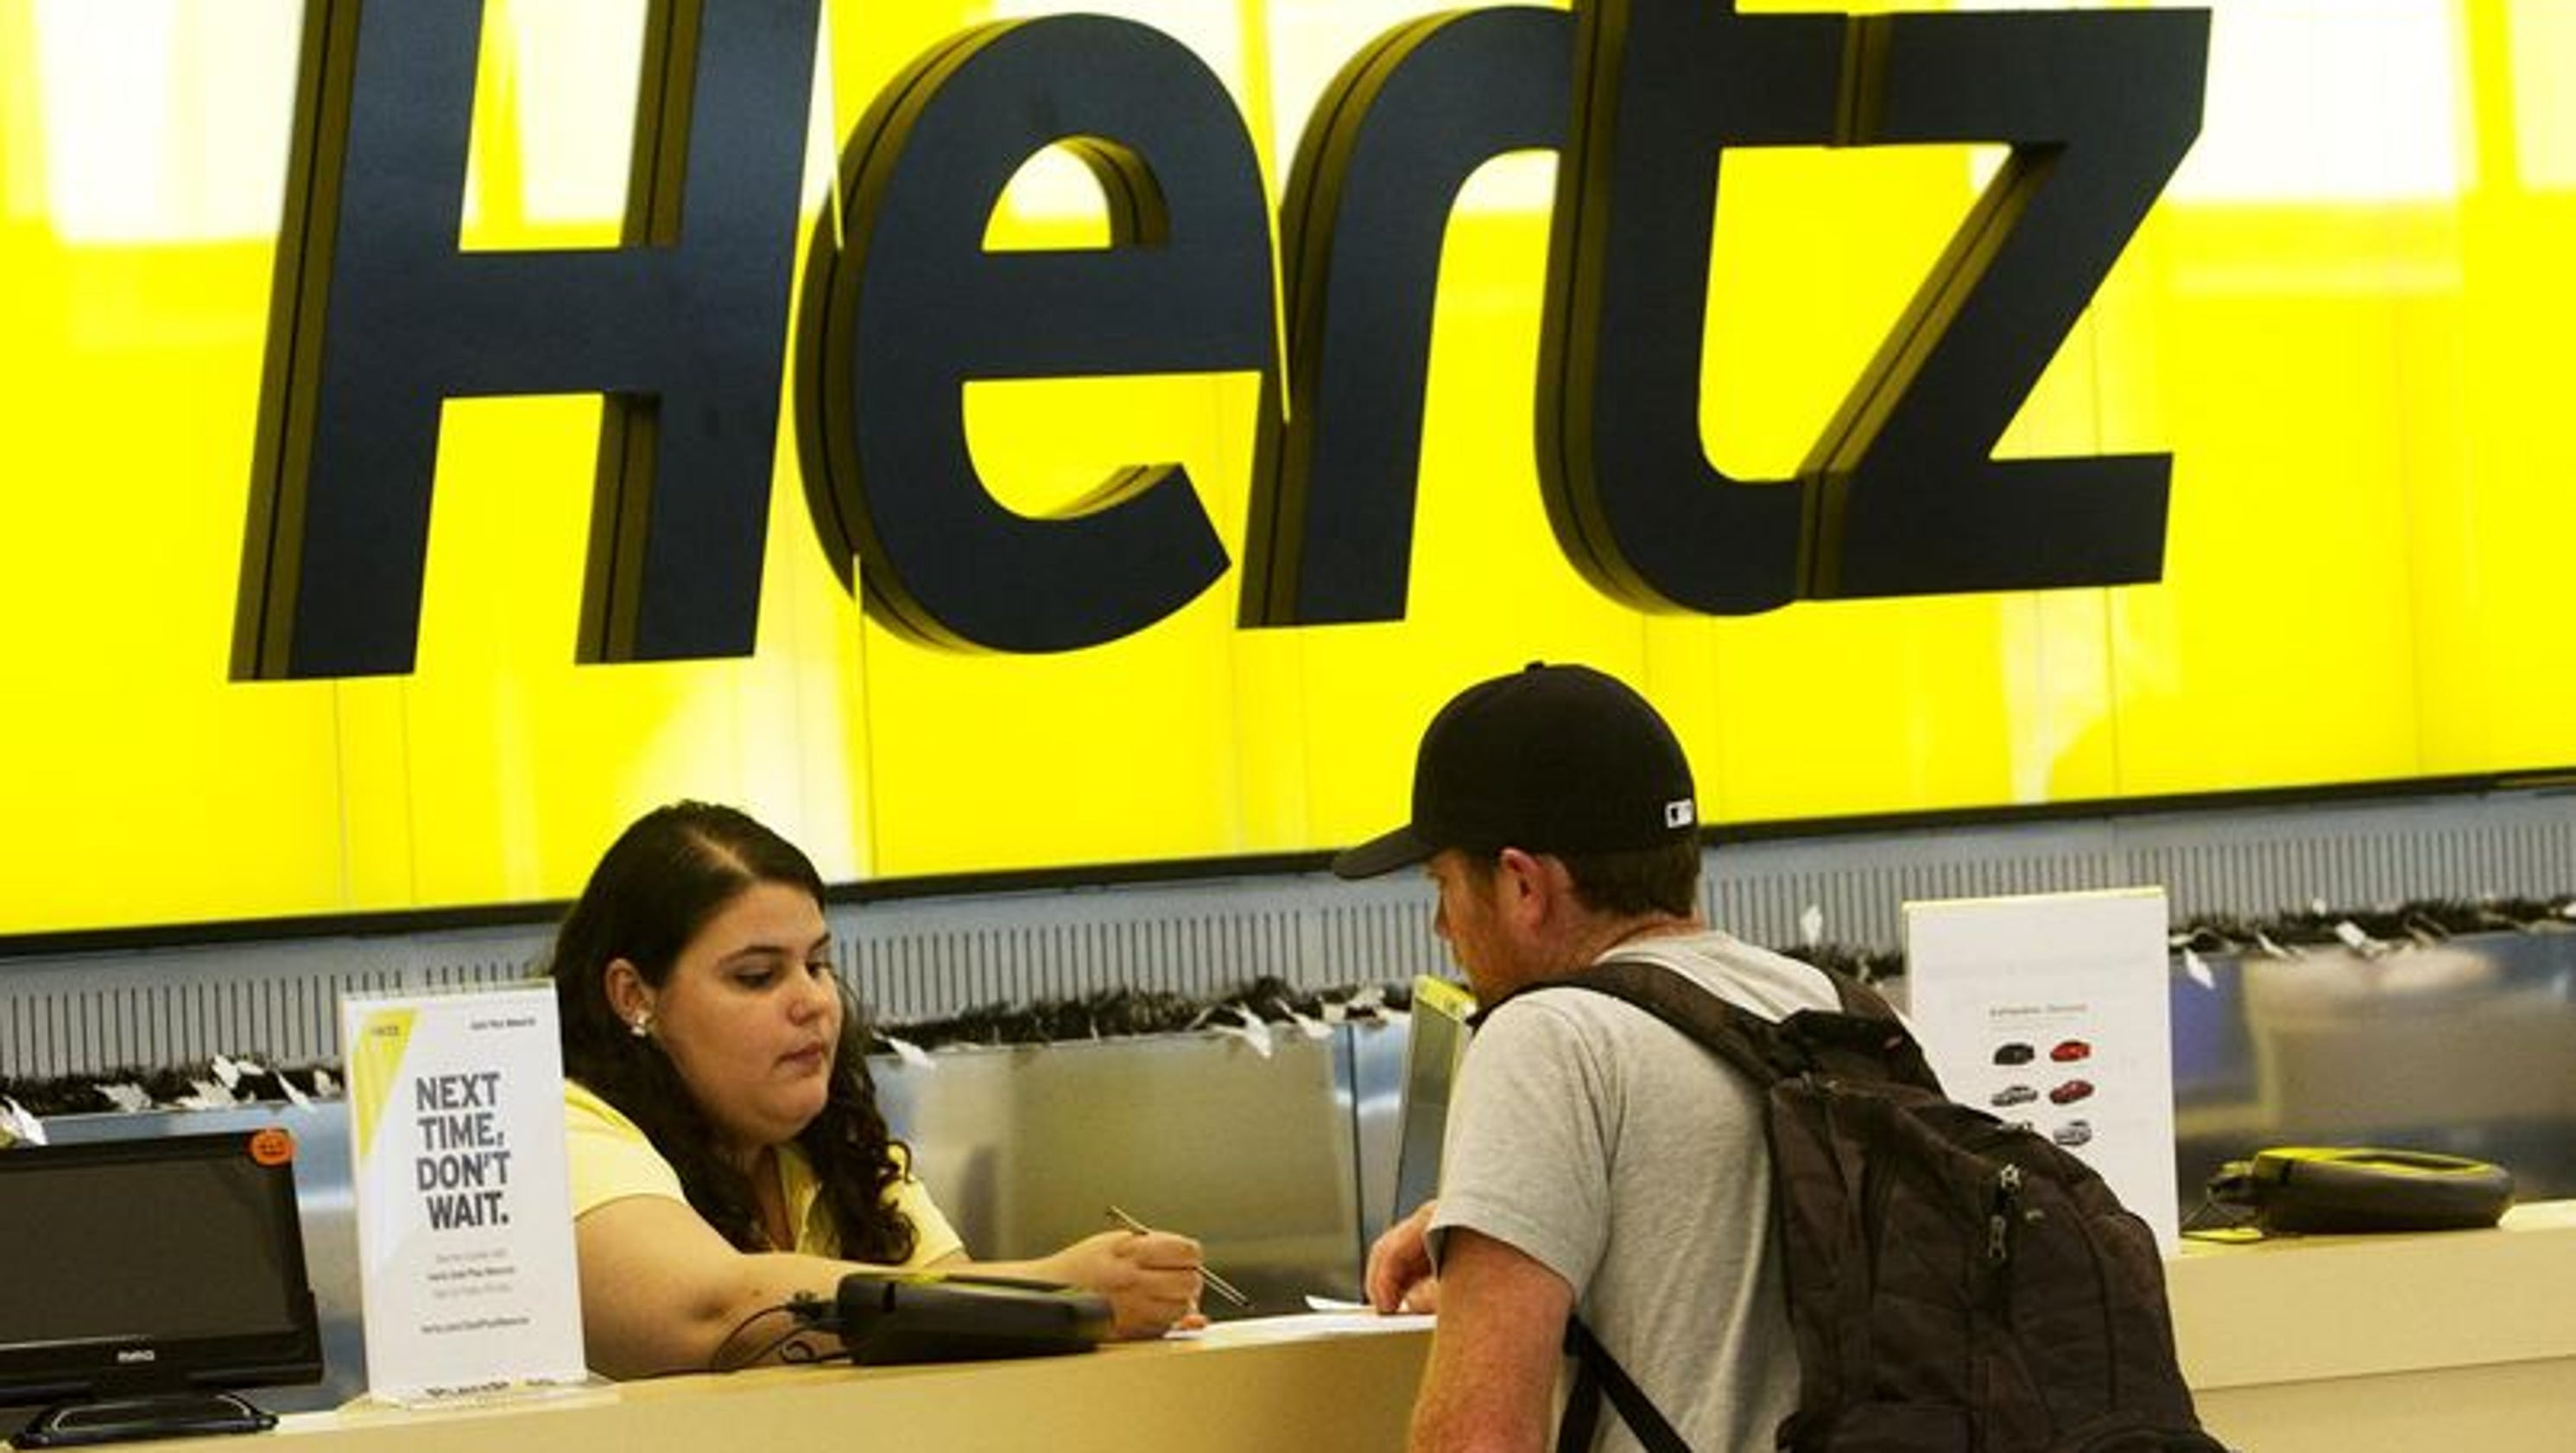 Secret project orange is hertz subsidiary buycottarizona Gallery